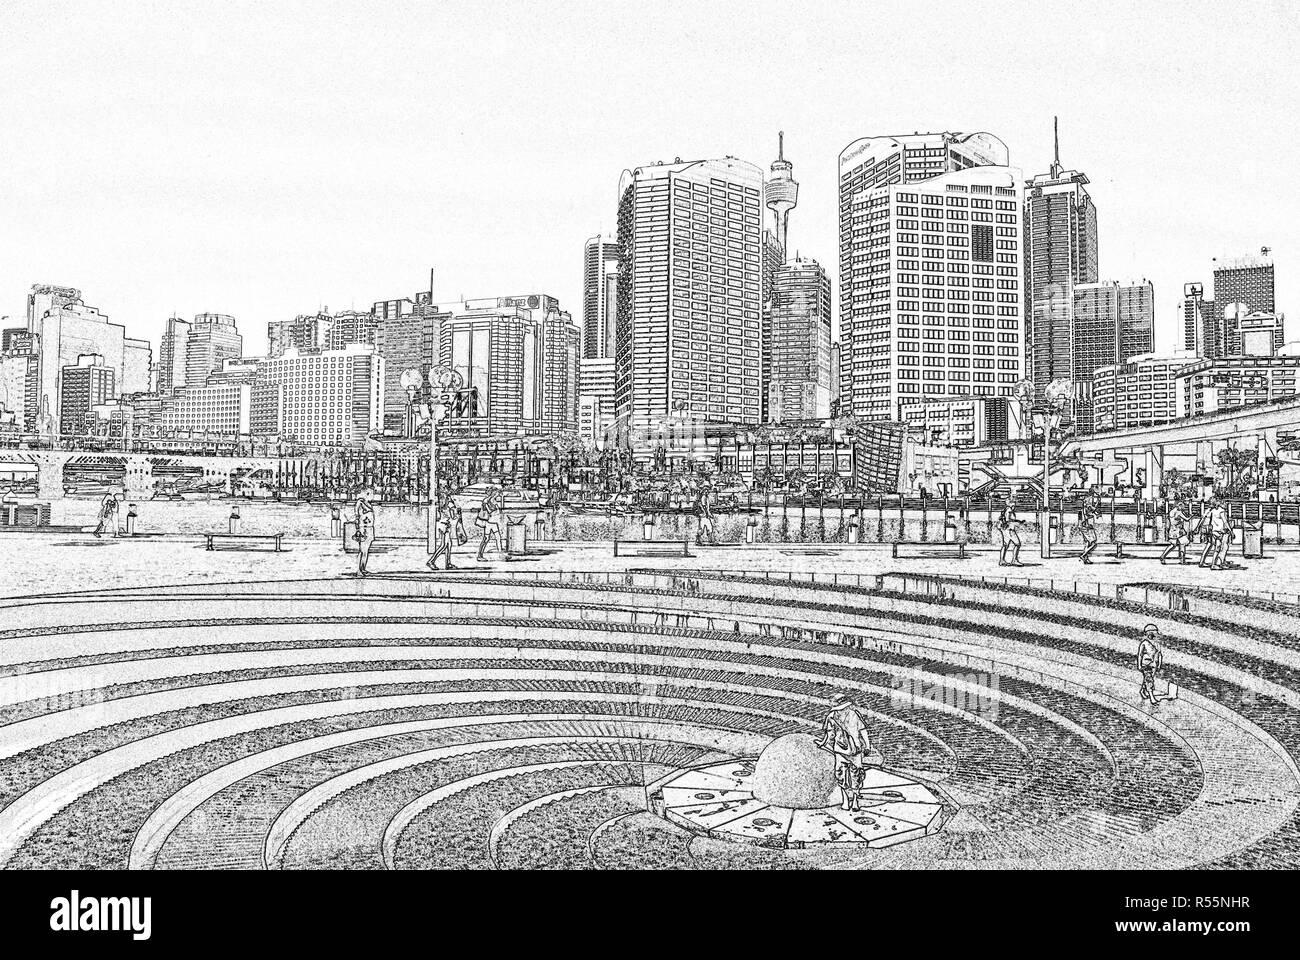 Spiral fountain, Darling harbor, Sydney, Australia (illustration) - Stock Image